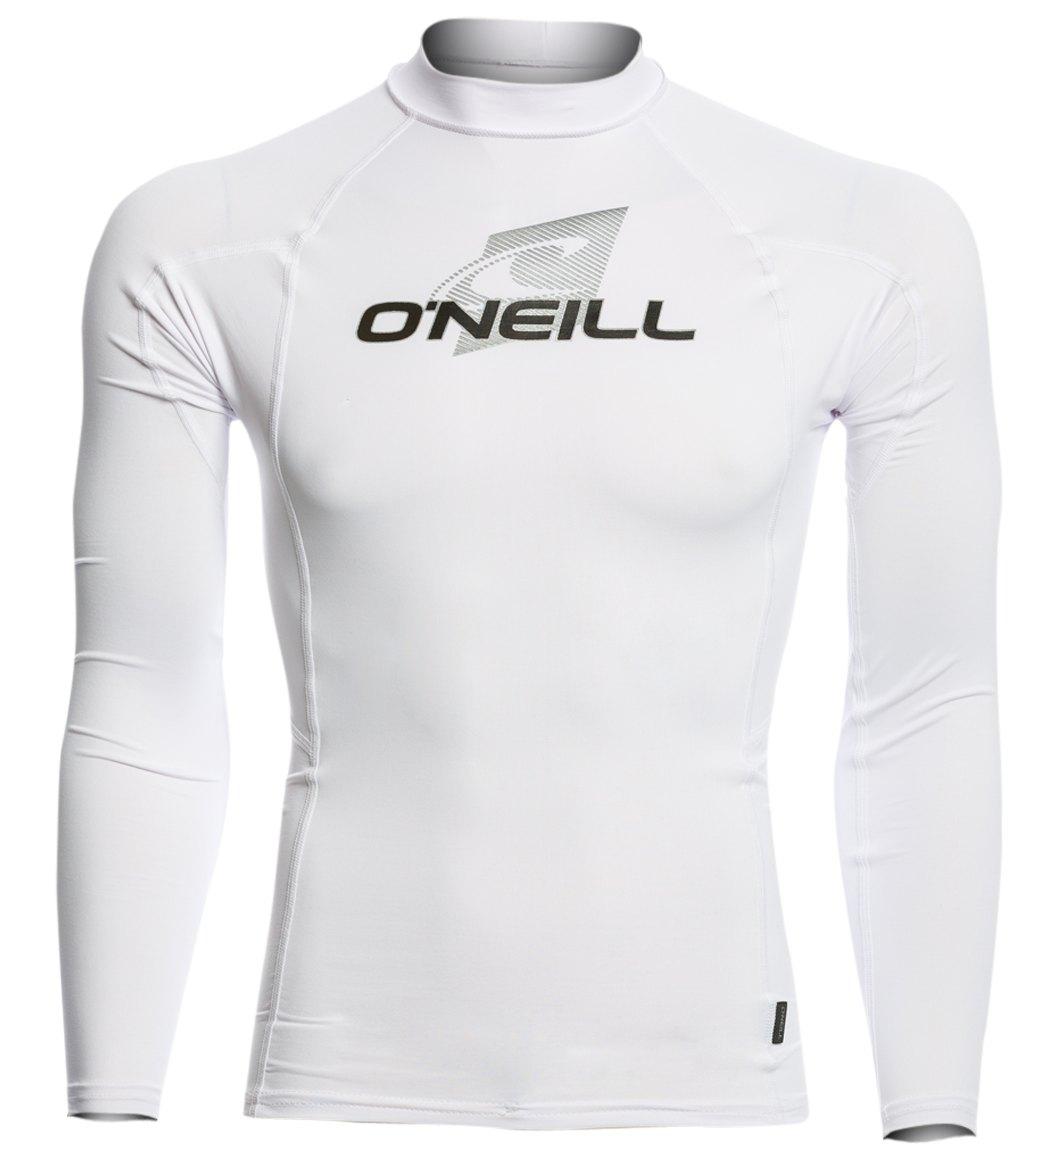 07cfb32f3 O'Neill Men's Skins Long Sleeve Crew Rashguard at SwimOutlet.com